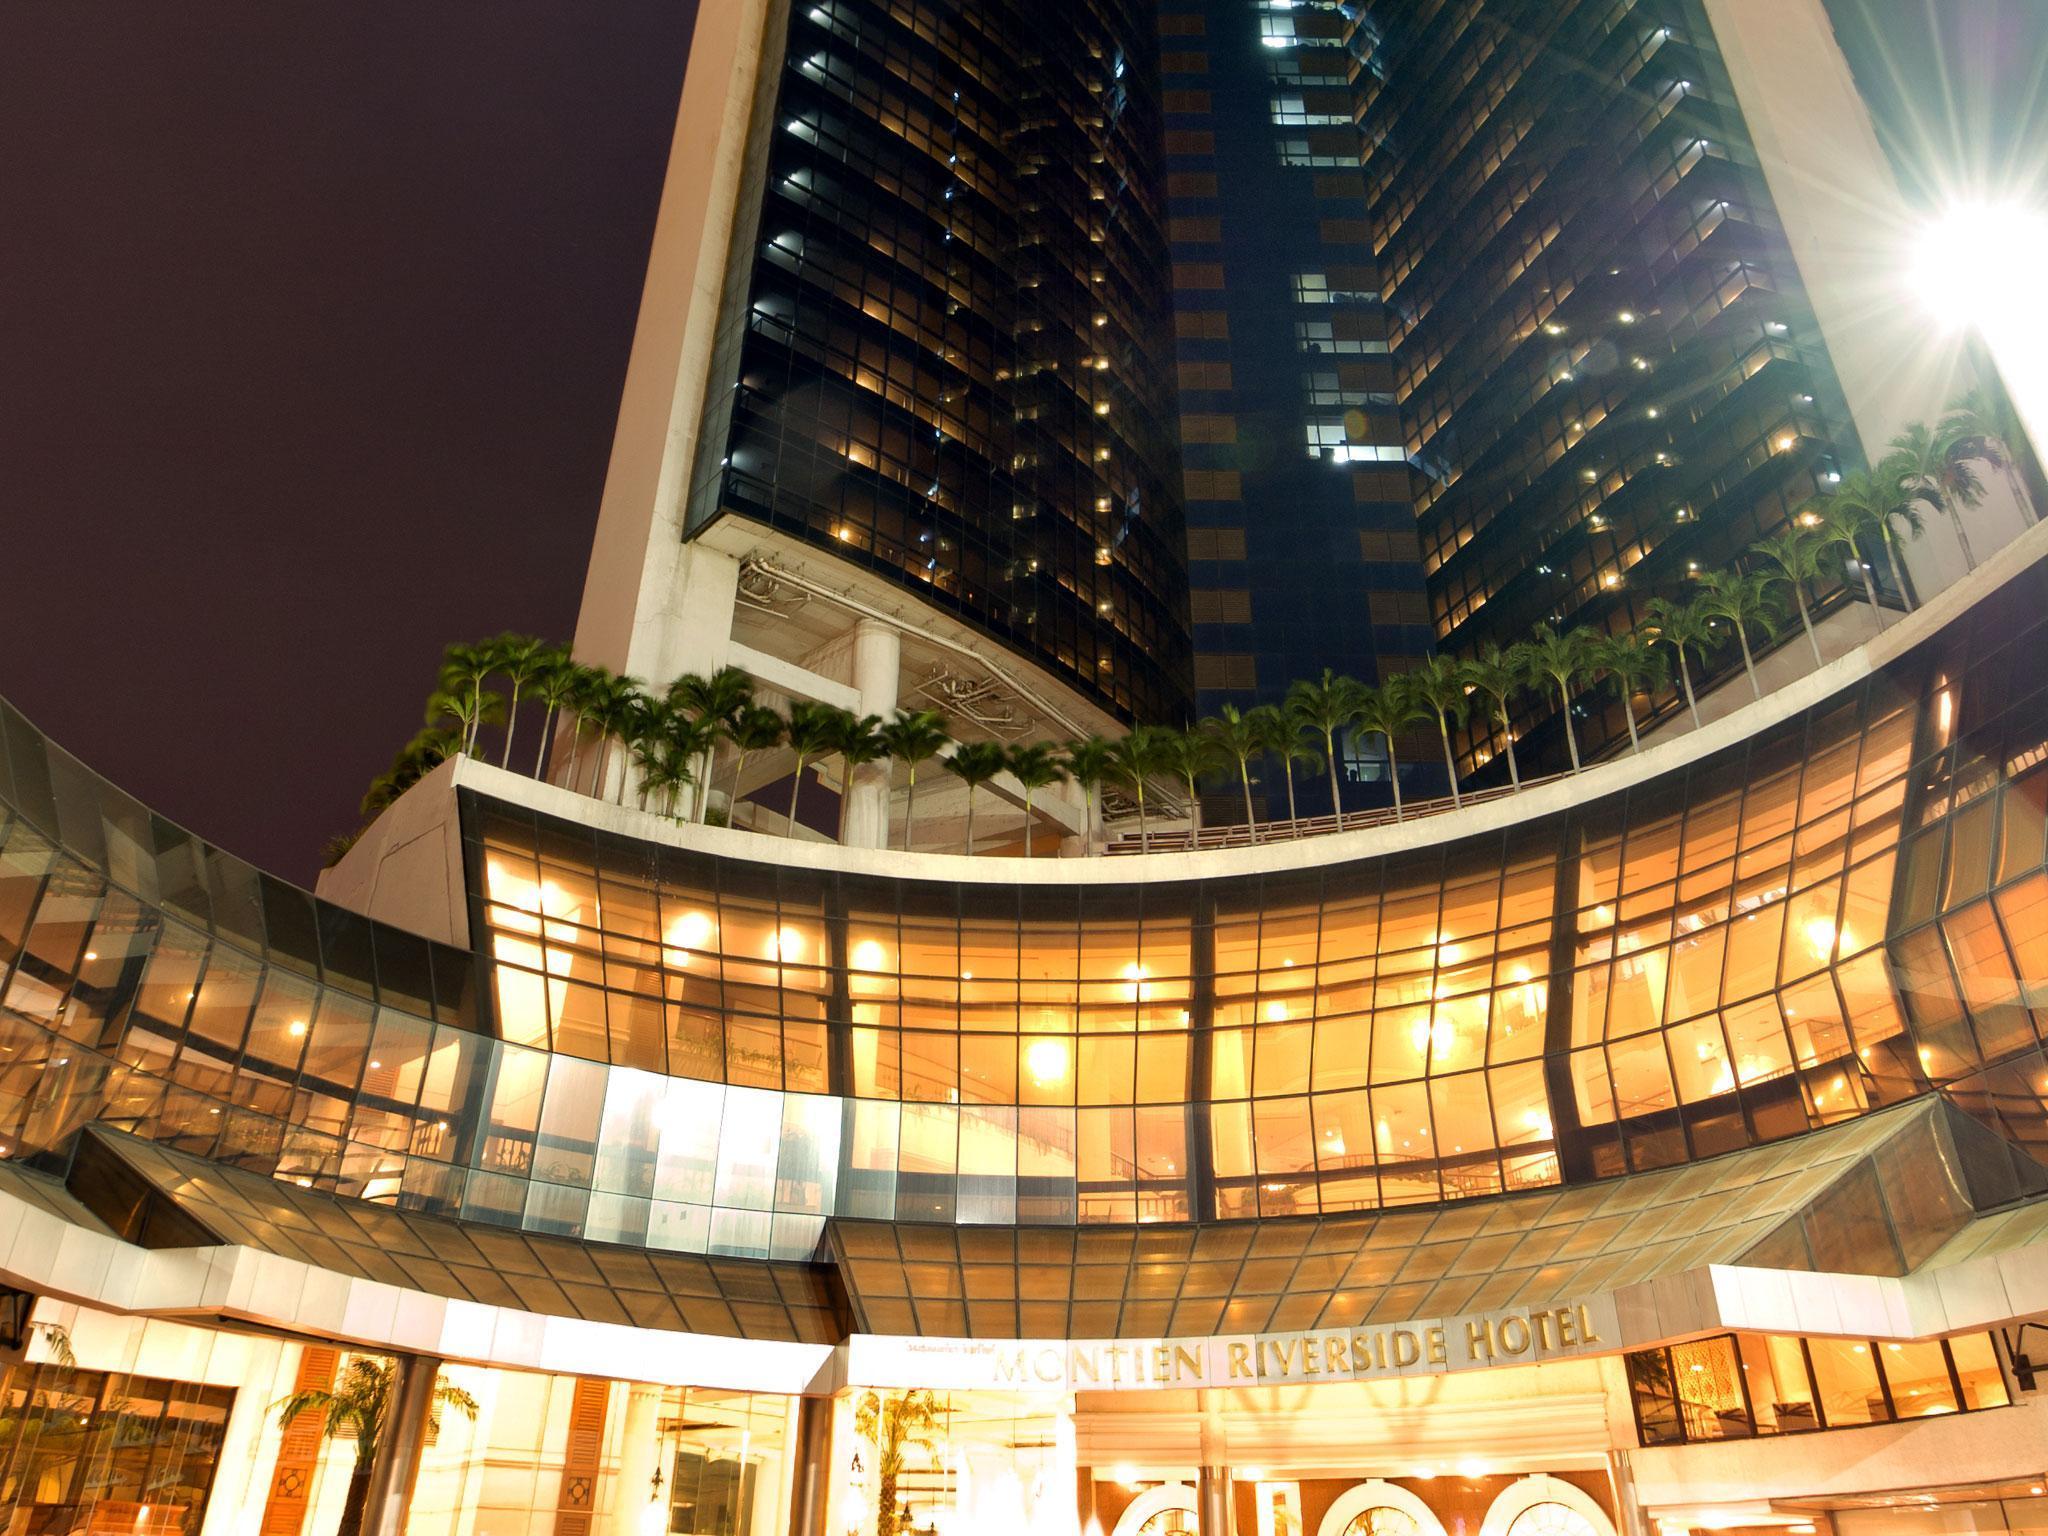 Montien Riverside Hotel โรงแรมมณเฑียร ริเวอร์ไซด์